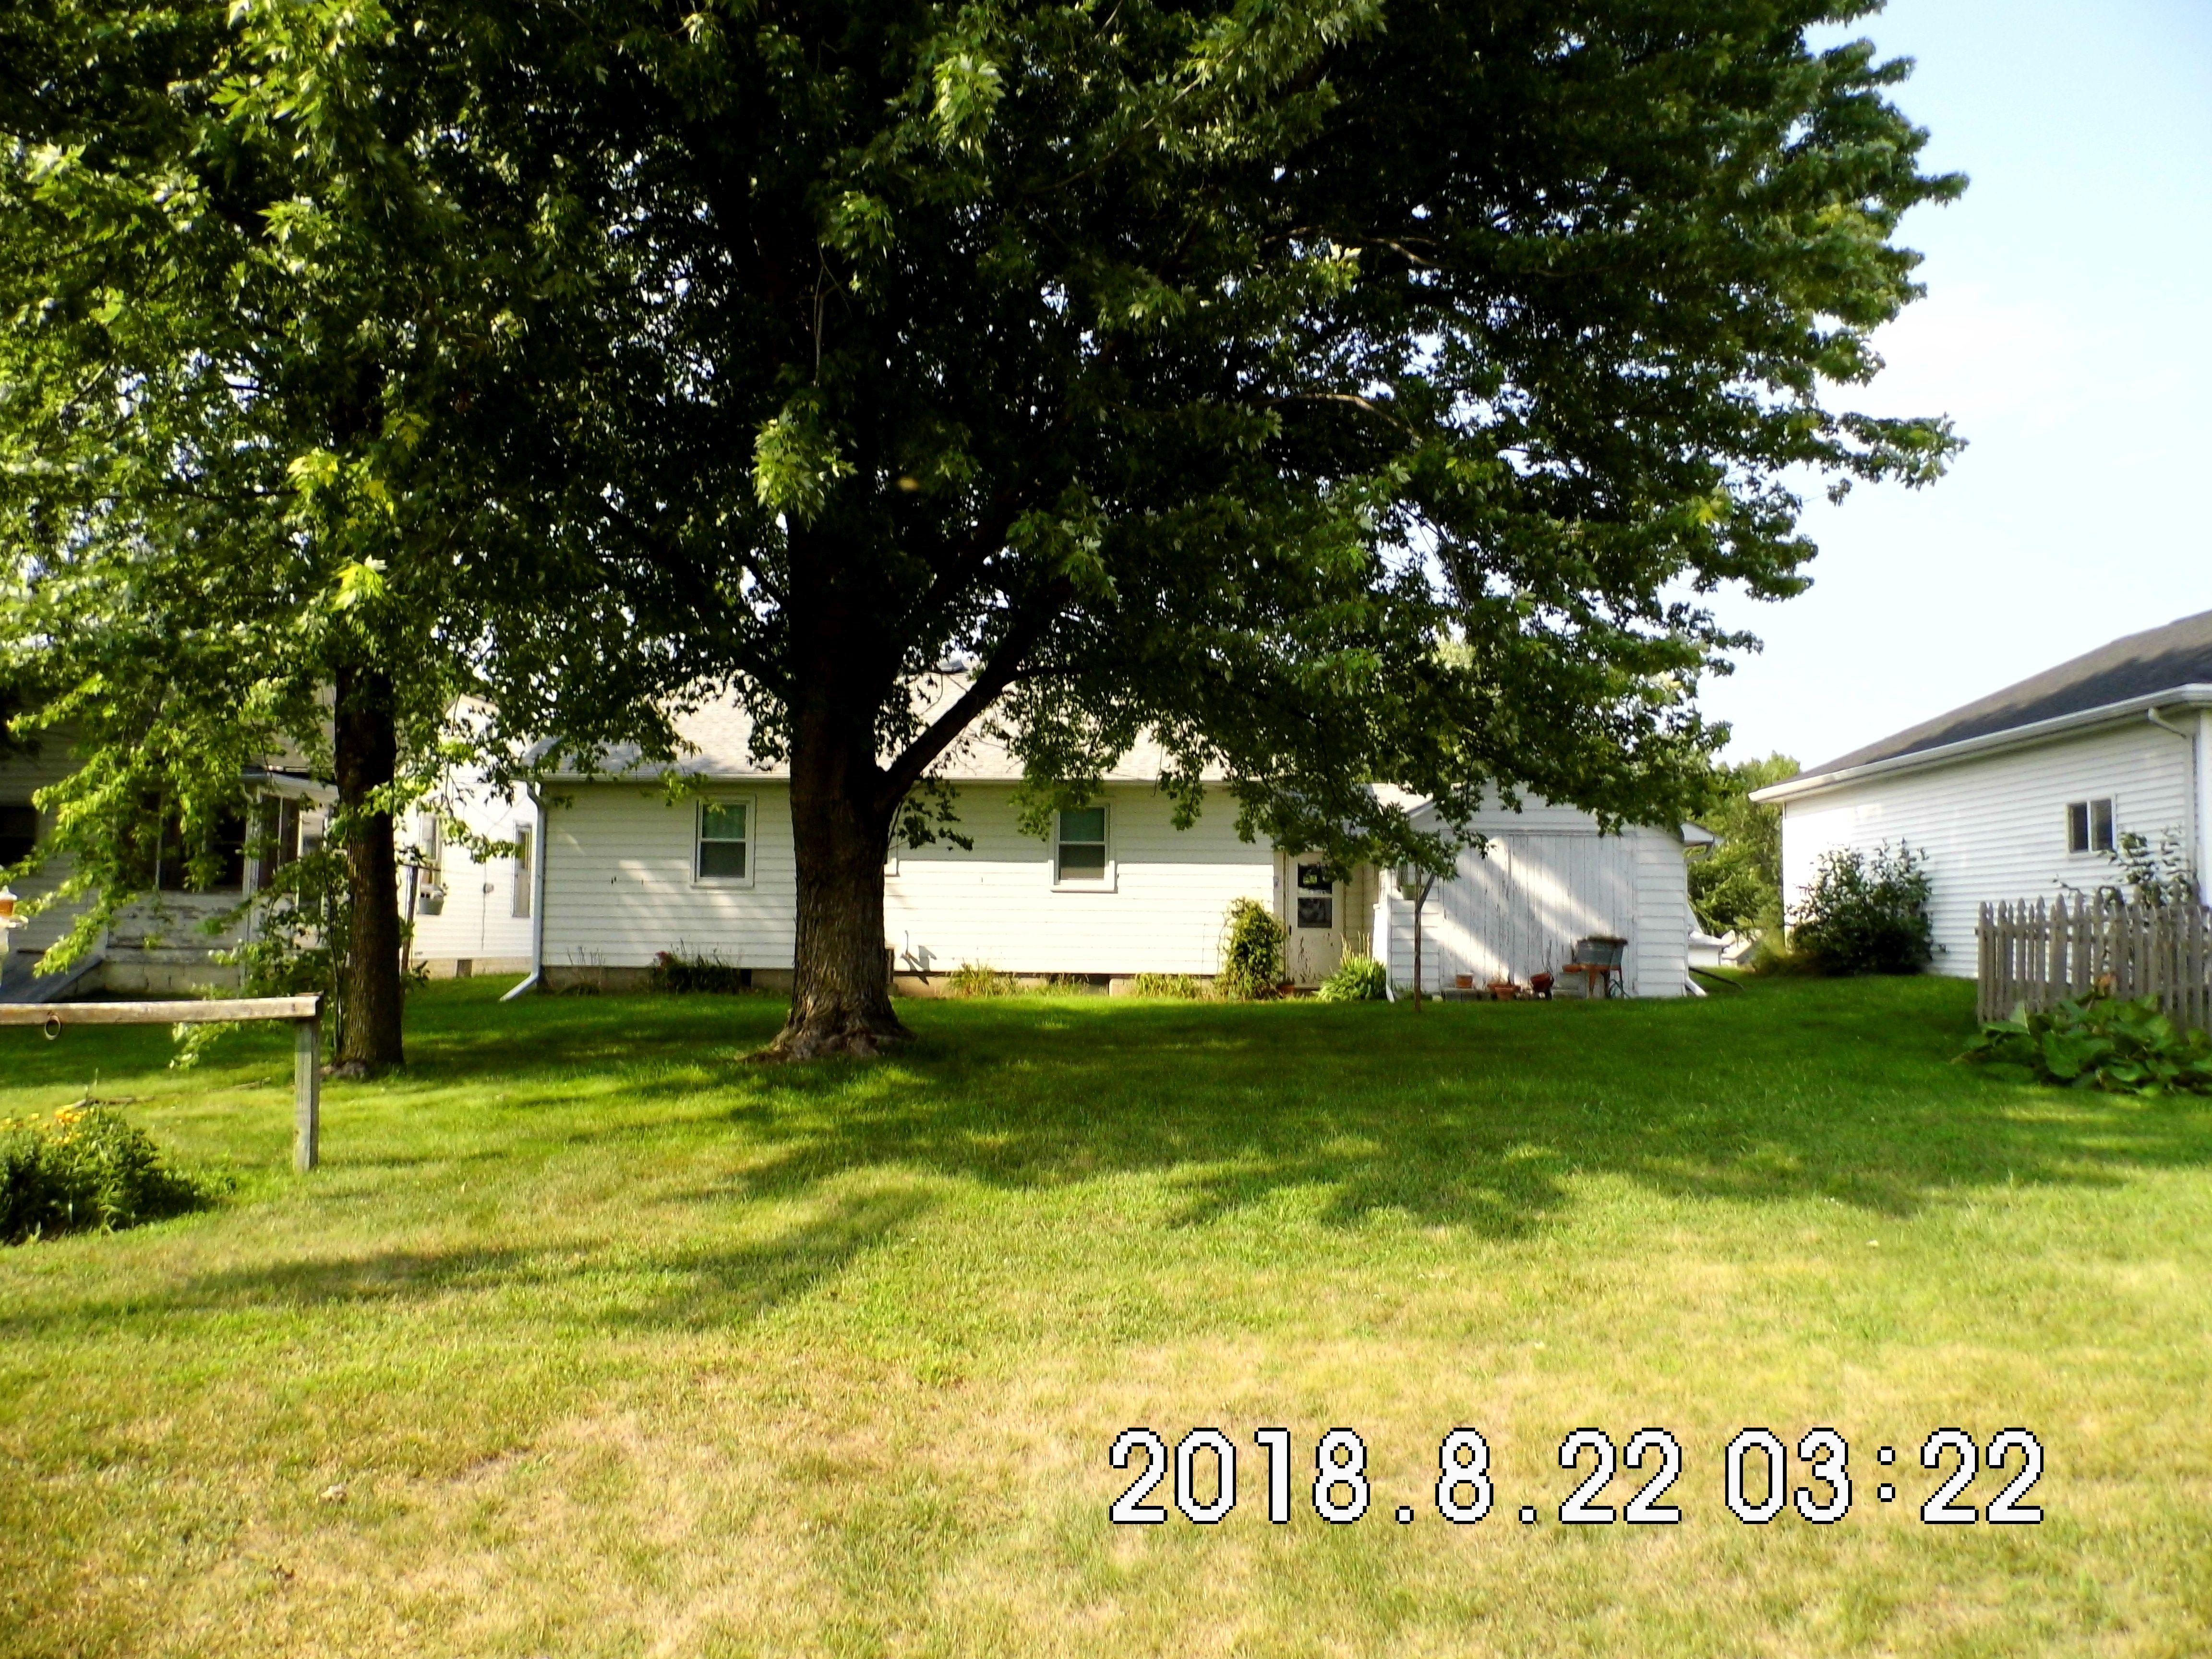 1.8 303 Elm St. Back yard